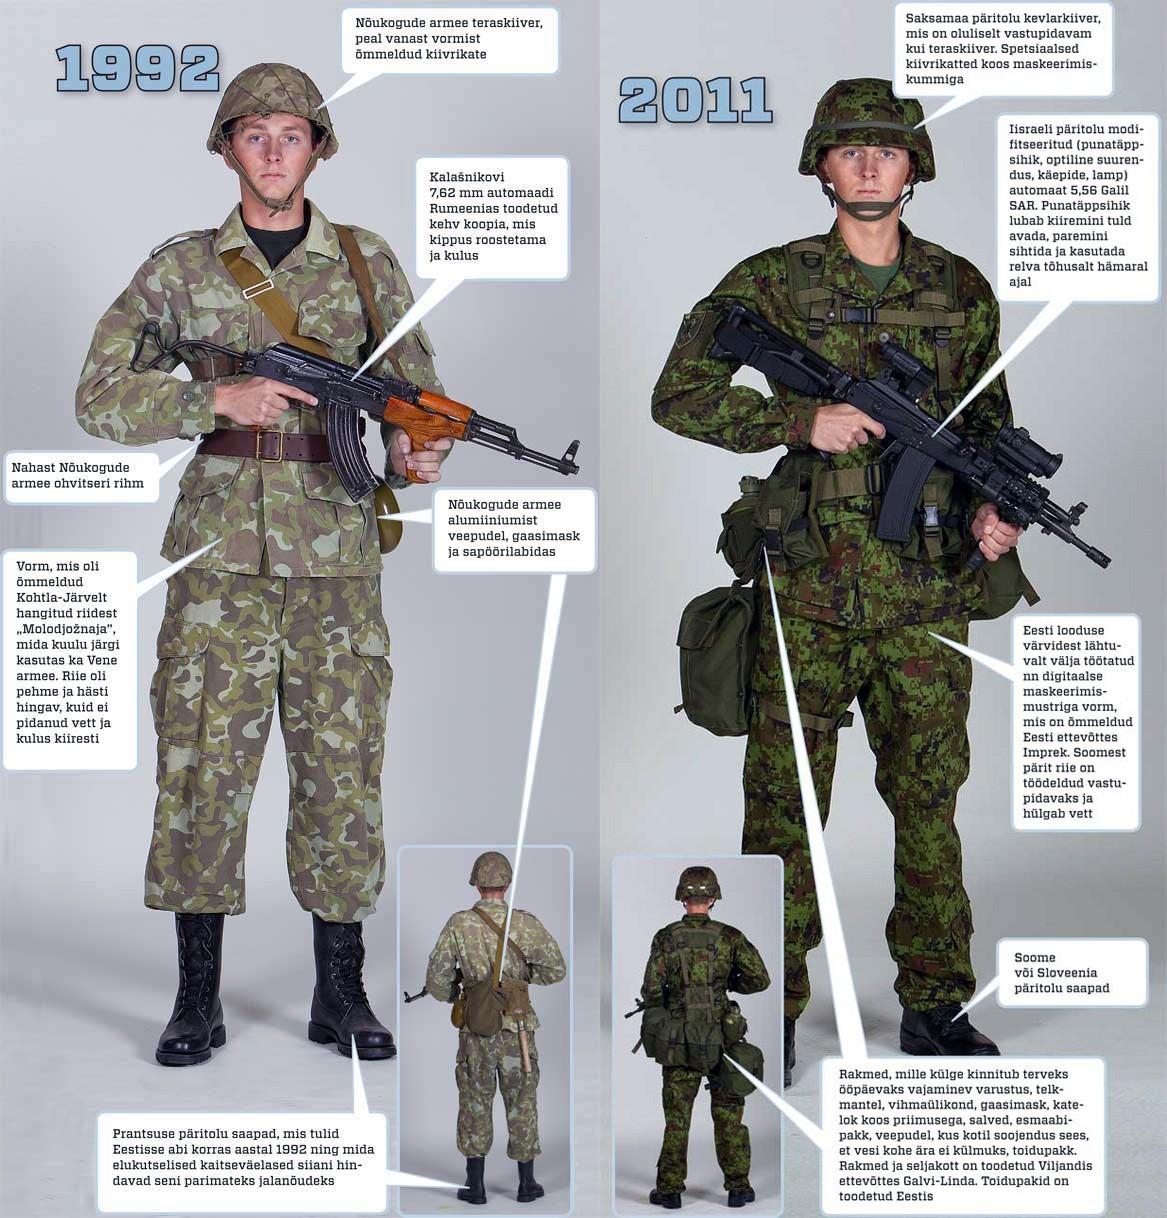 New Versus Old Uniform and Kit SJdjZJ